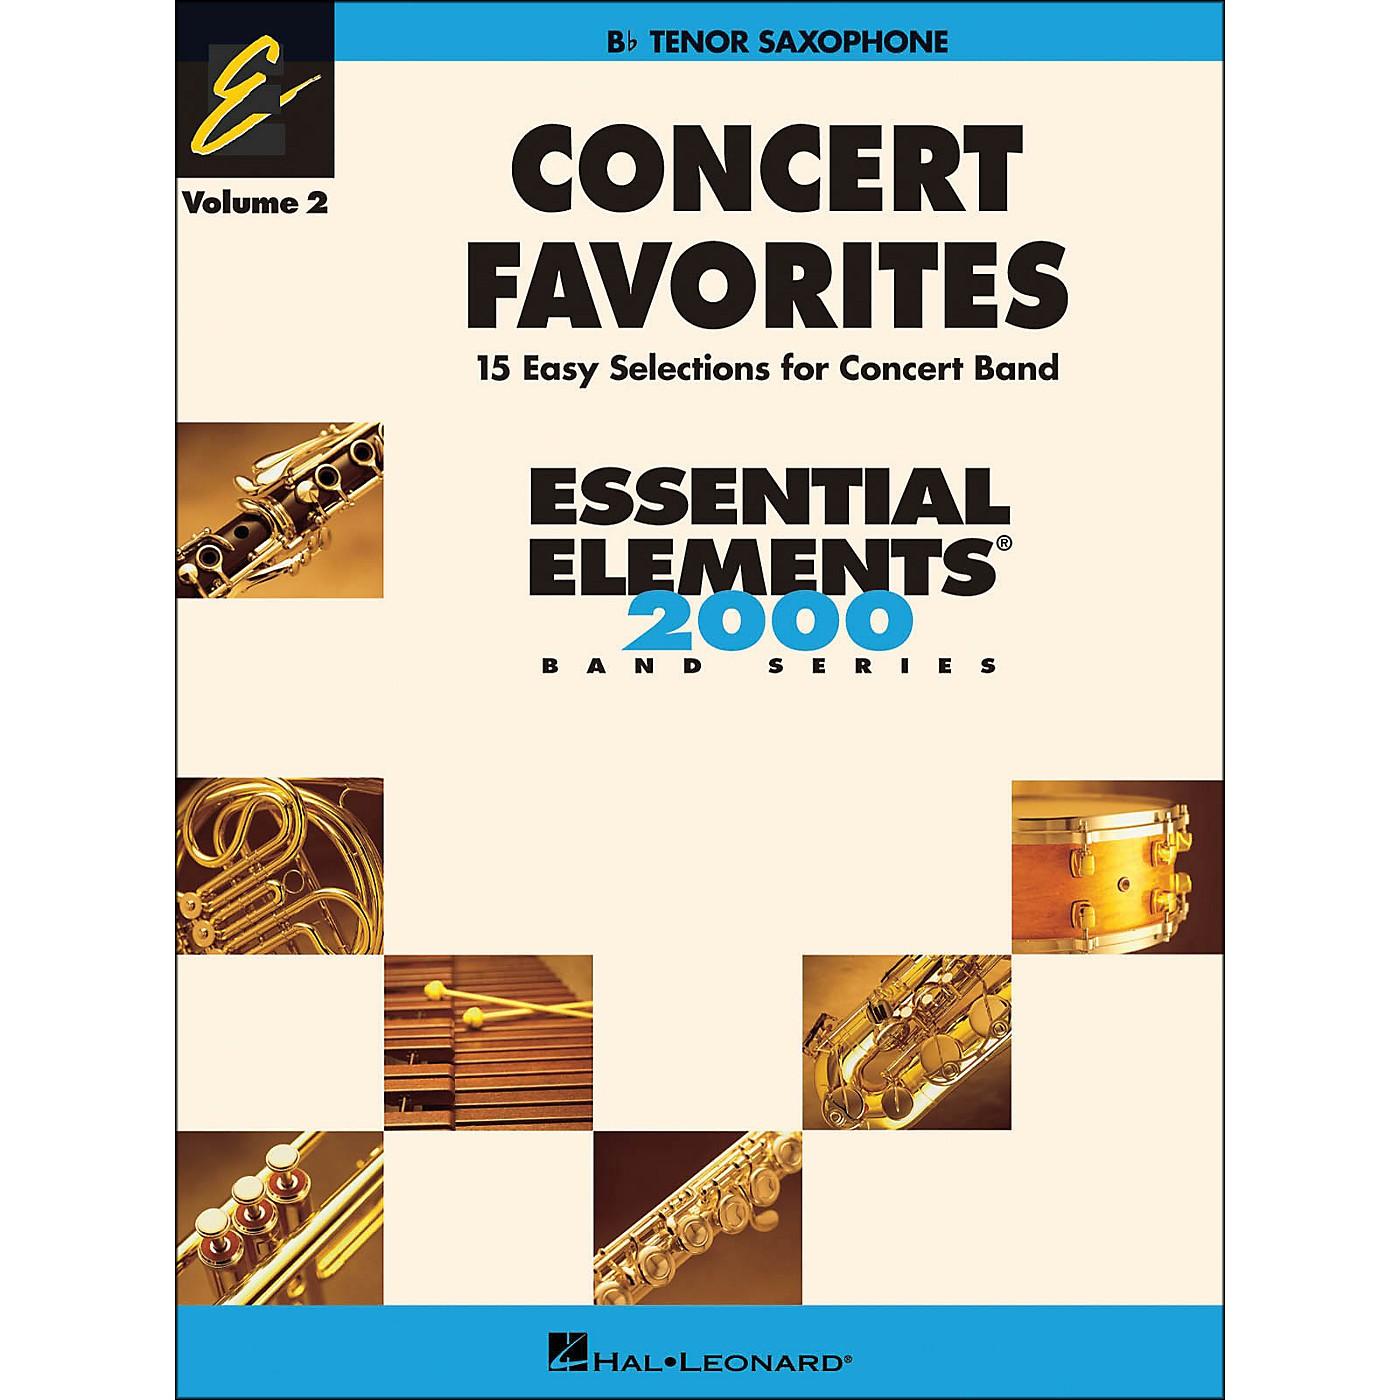 Hal Leonard Concert Favorites Volume 2 Tenor Sax Essential Elements Band Series thumbnail